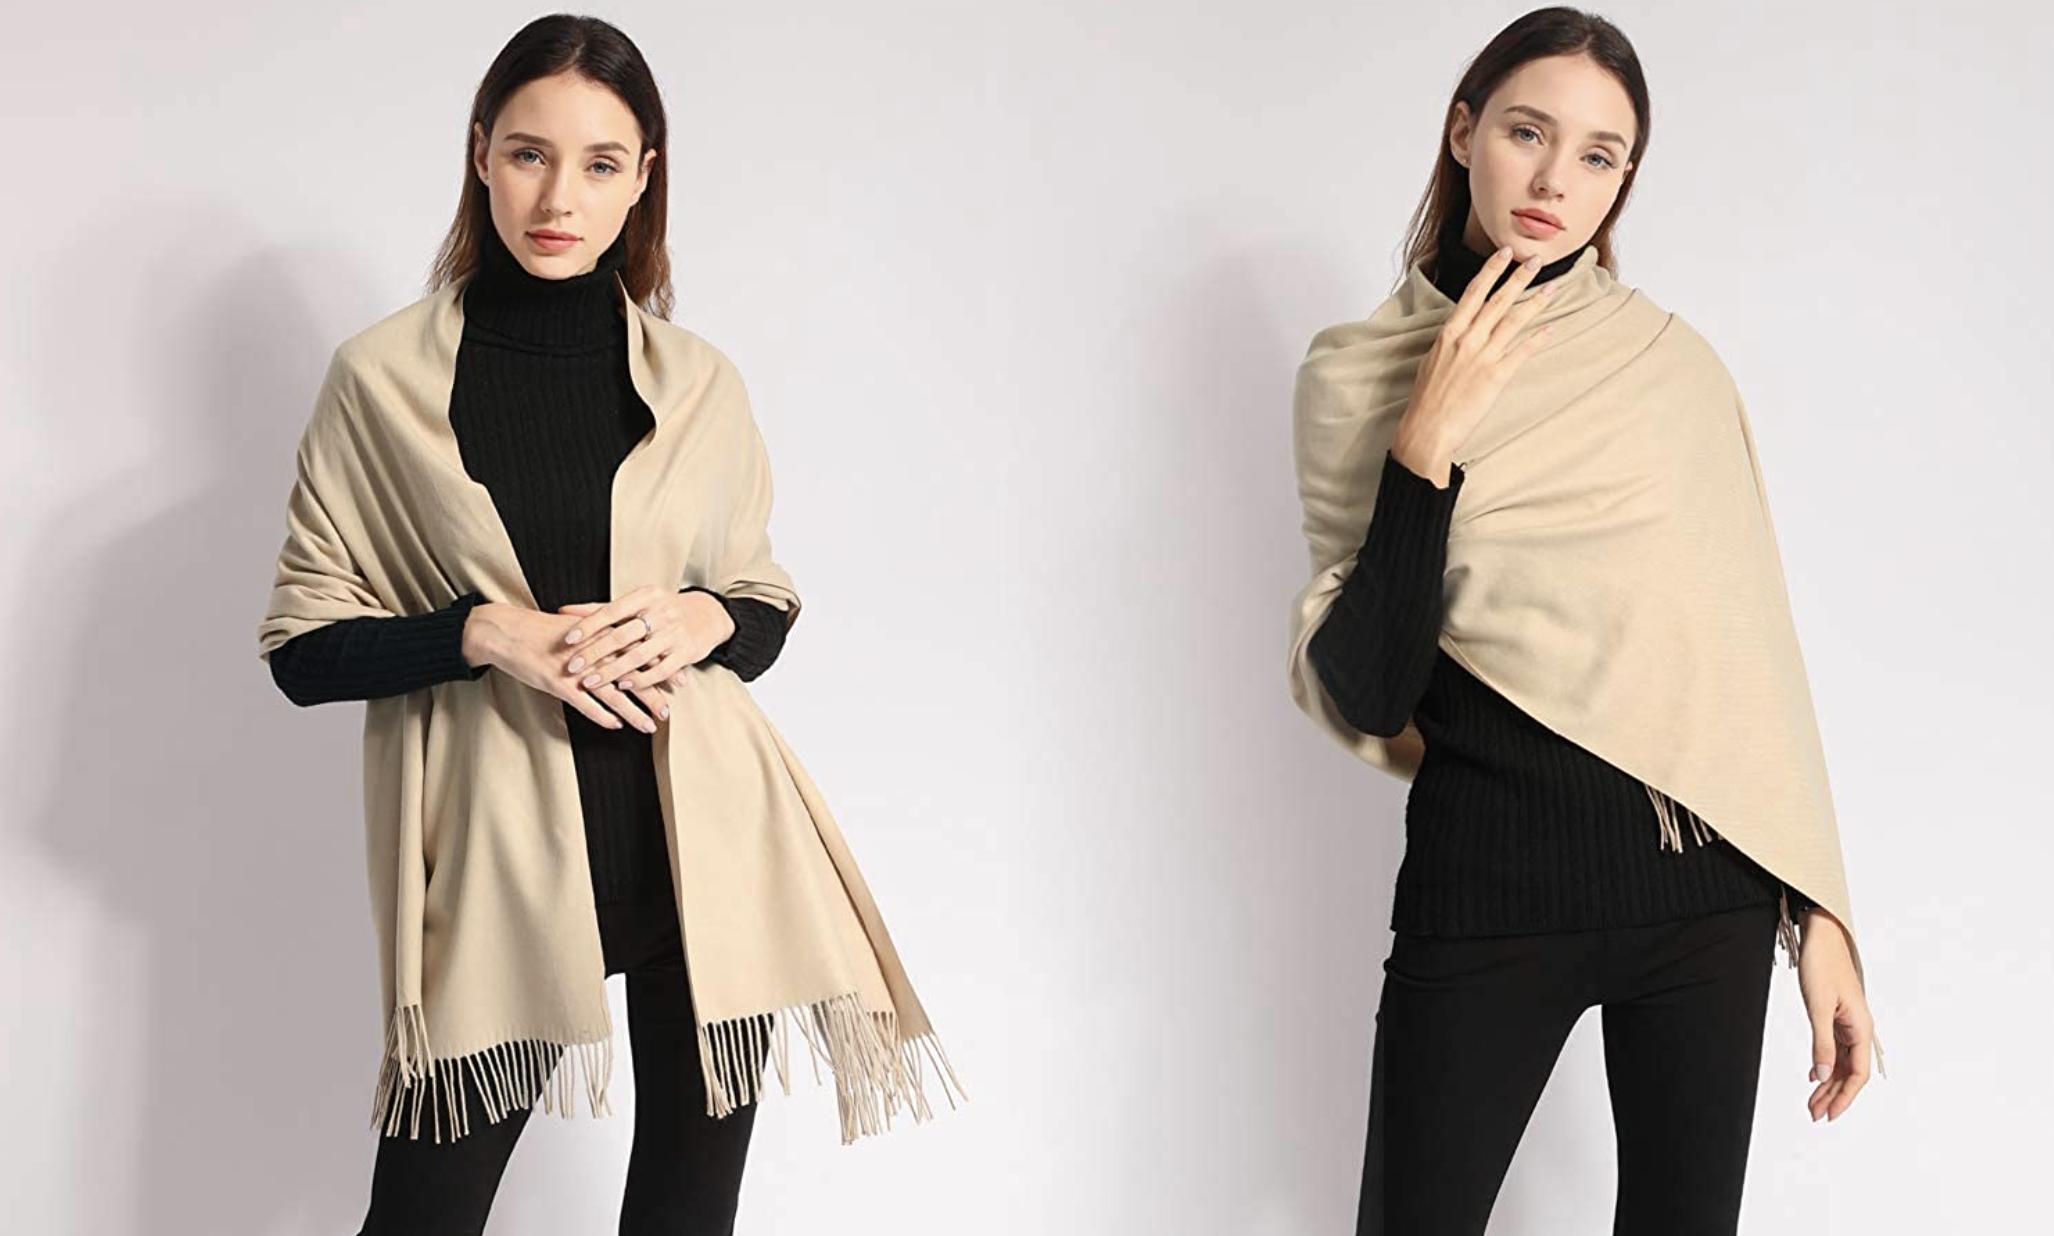 model wearing the scarf in tan